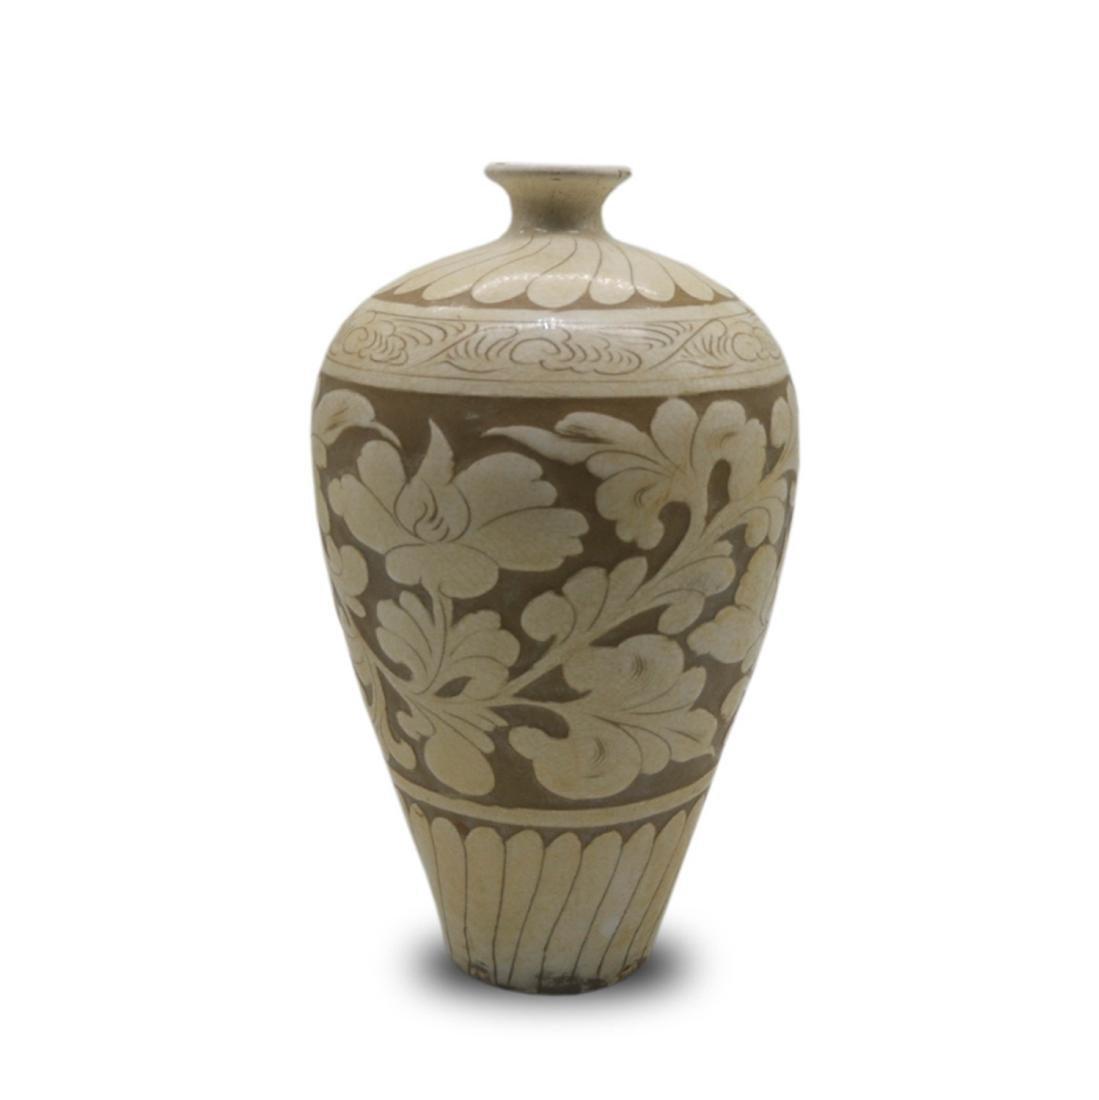 Chinese Ci Zhou WarePorcelain Floral Vase - 2